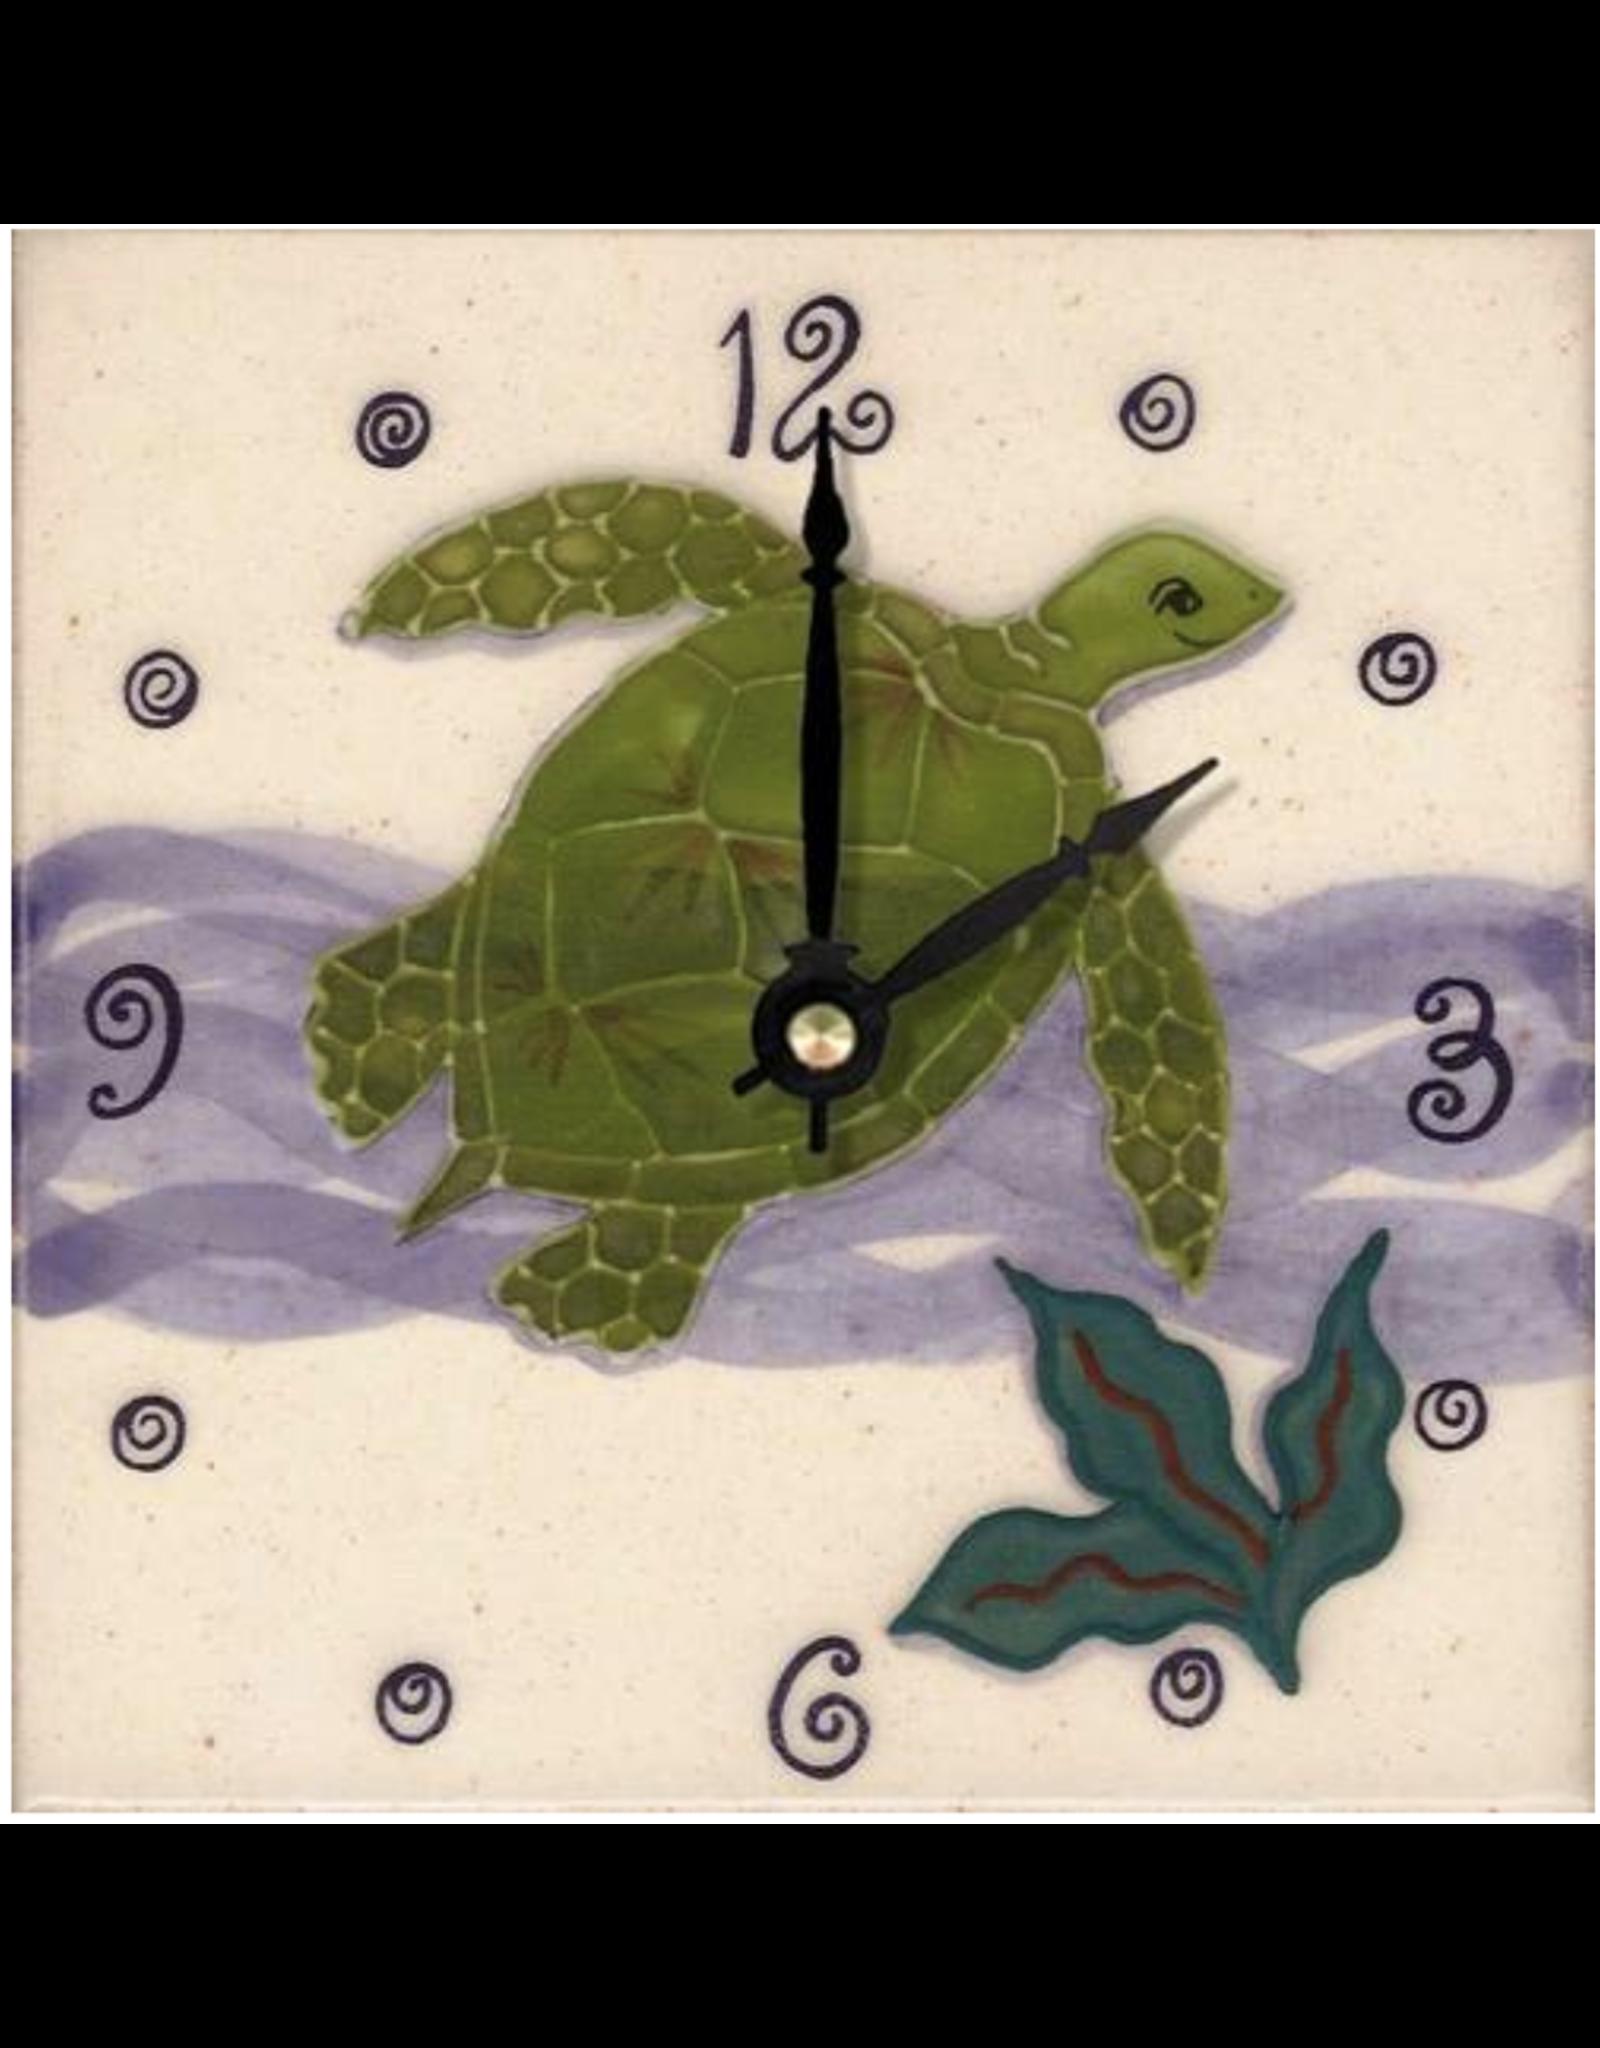 Banana Patch Studio 6x6 Handpainted Tile Clock - Honu